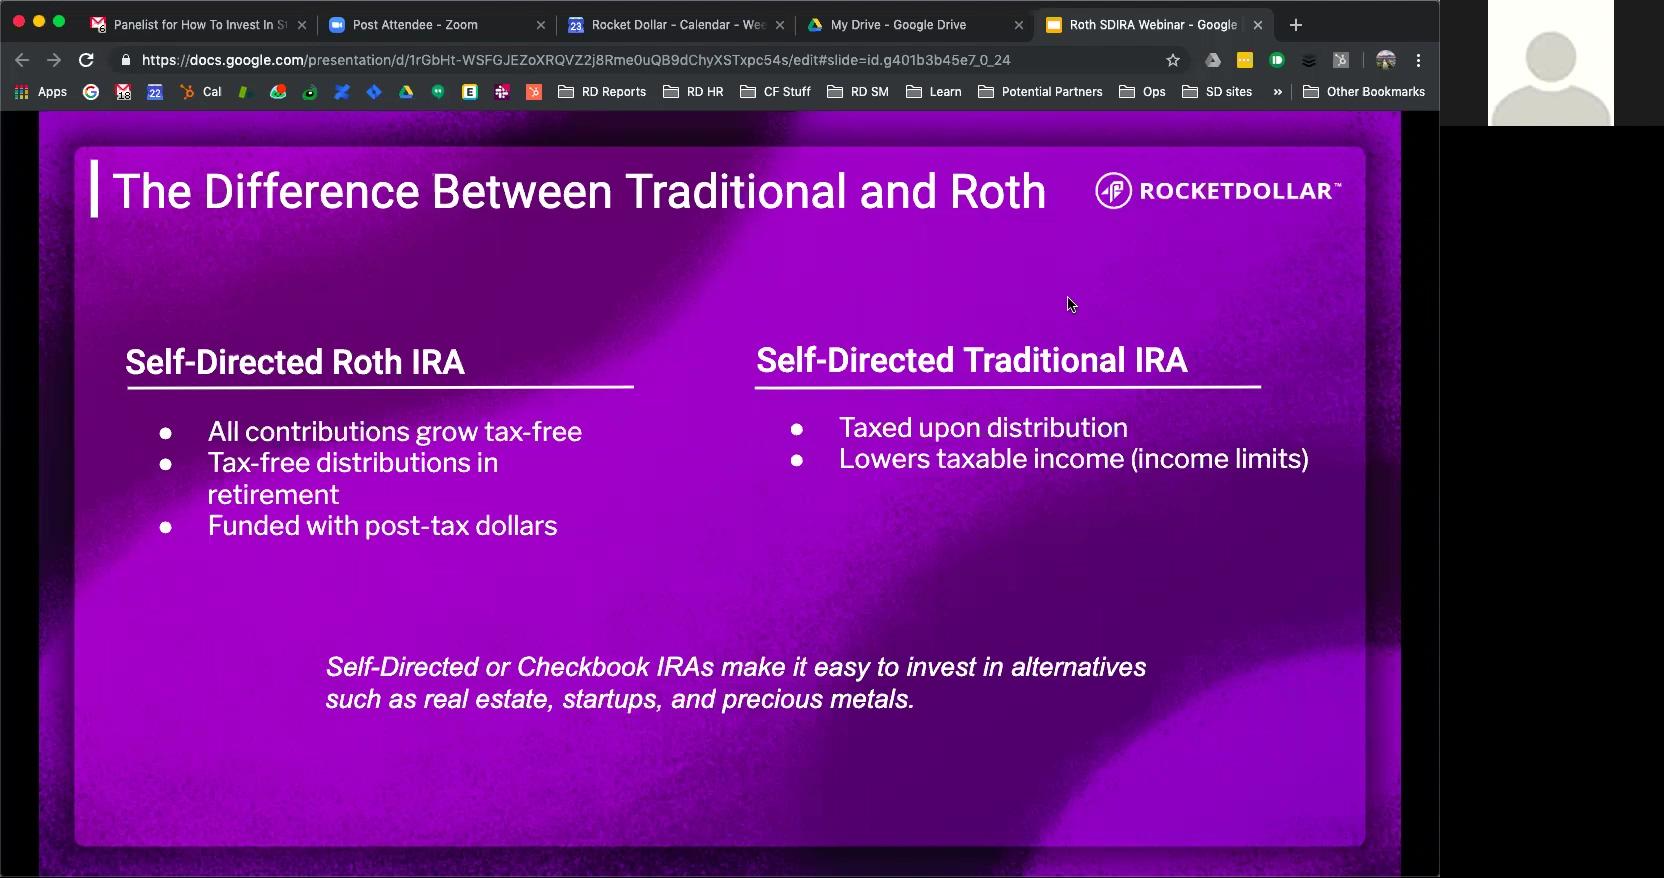 Roth IRA Webinar Chris P